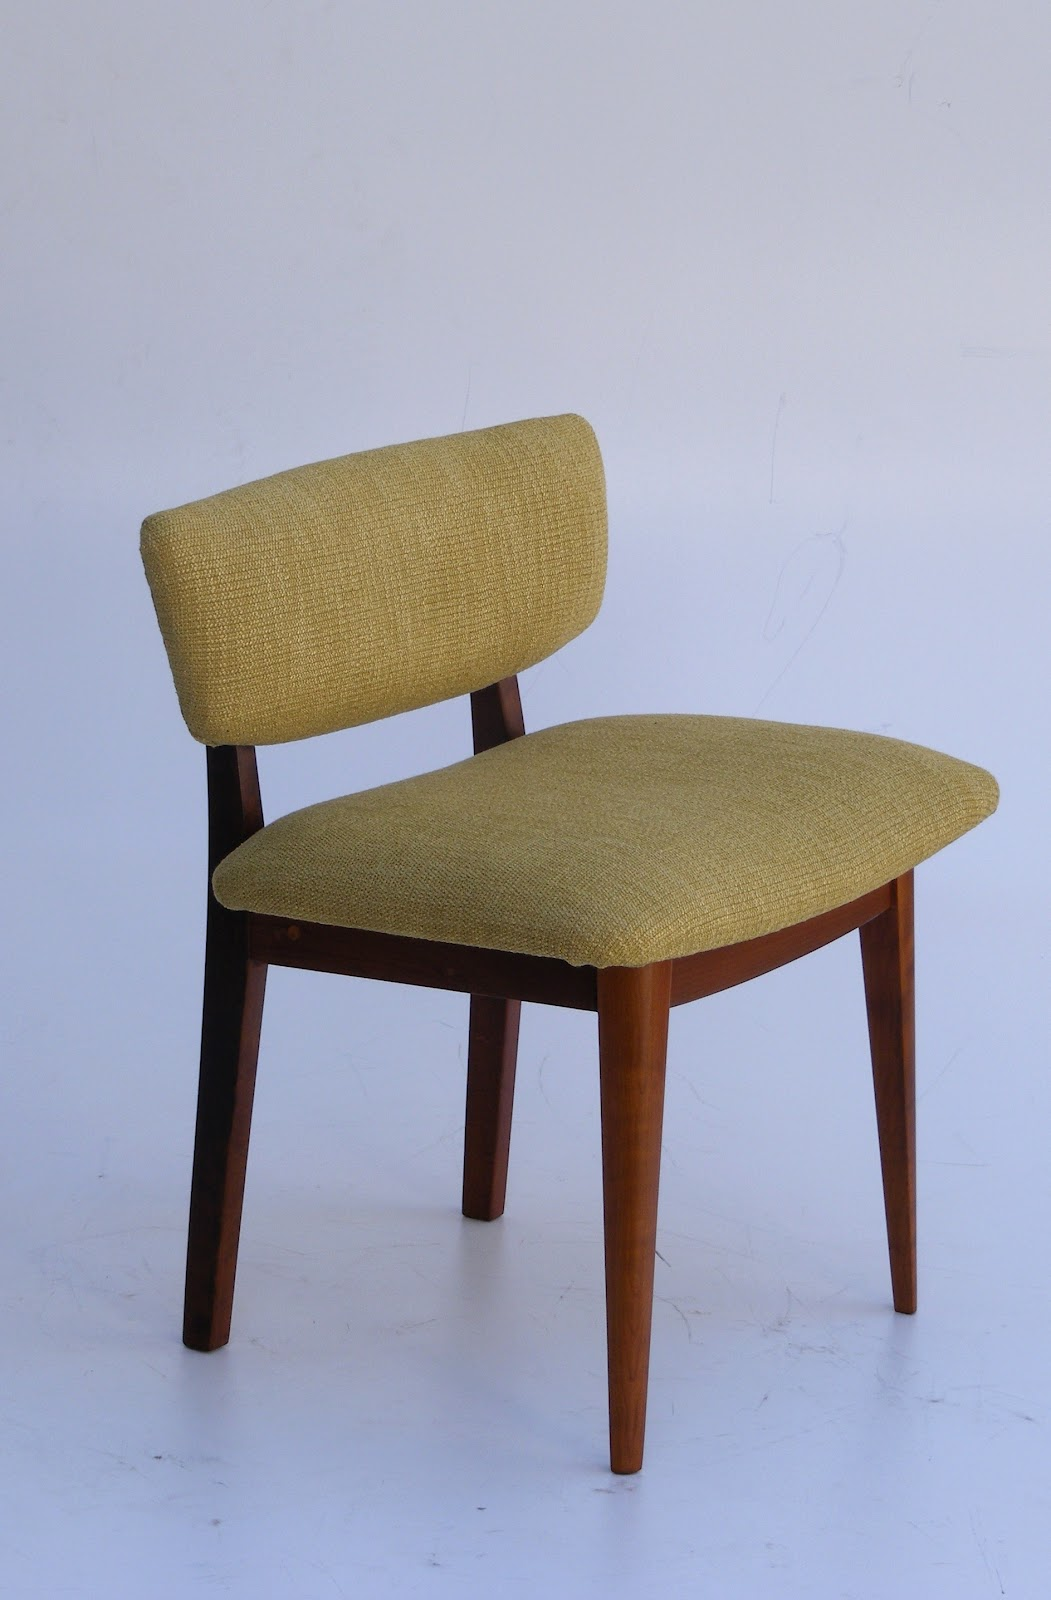 Vamp Furniture New Revamped Vintage Furniture Stock At